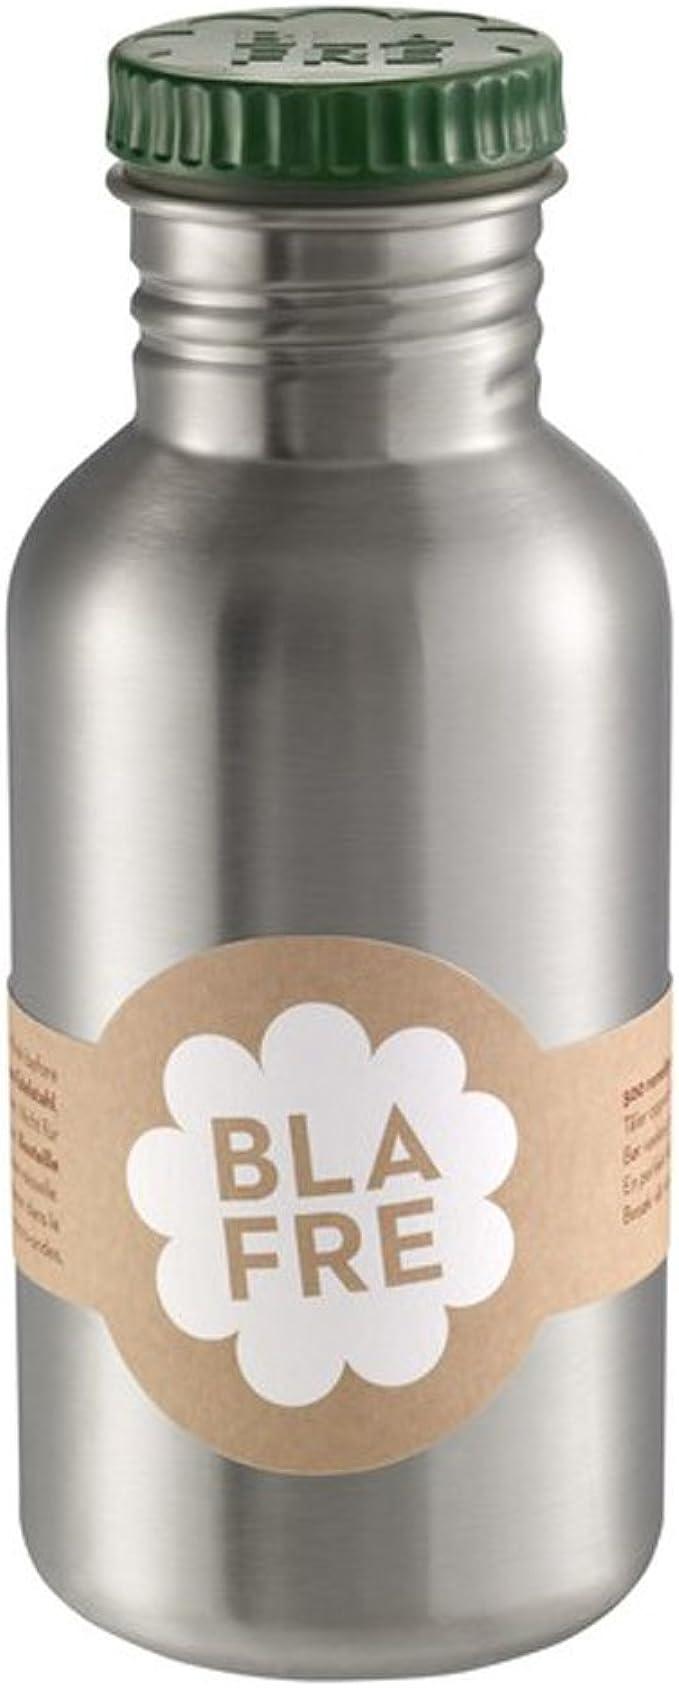 BLAFRE Edelstahl Trinkflasche 300ml hellblau